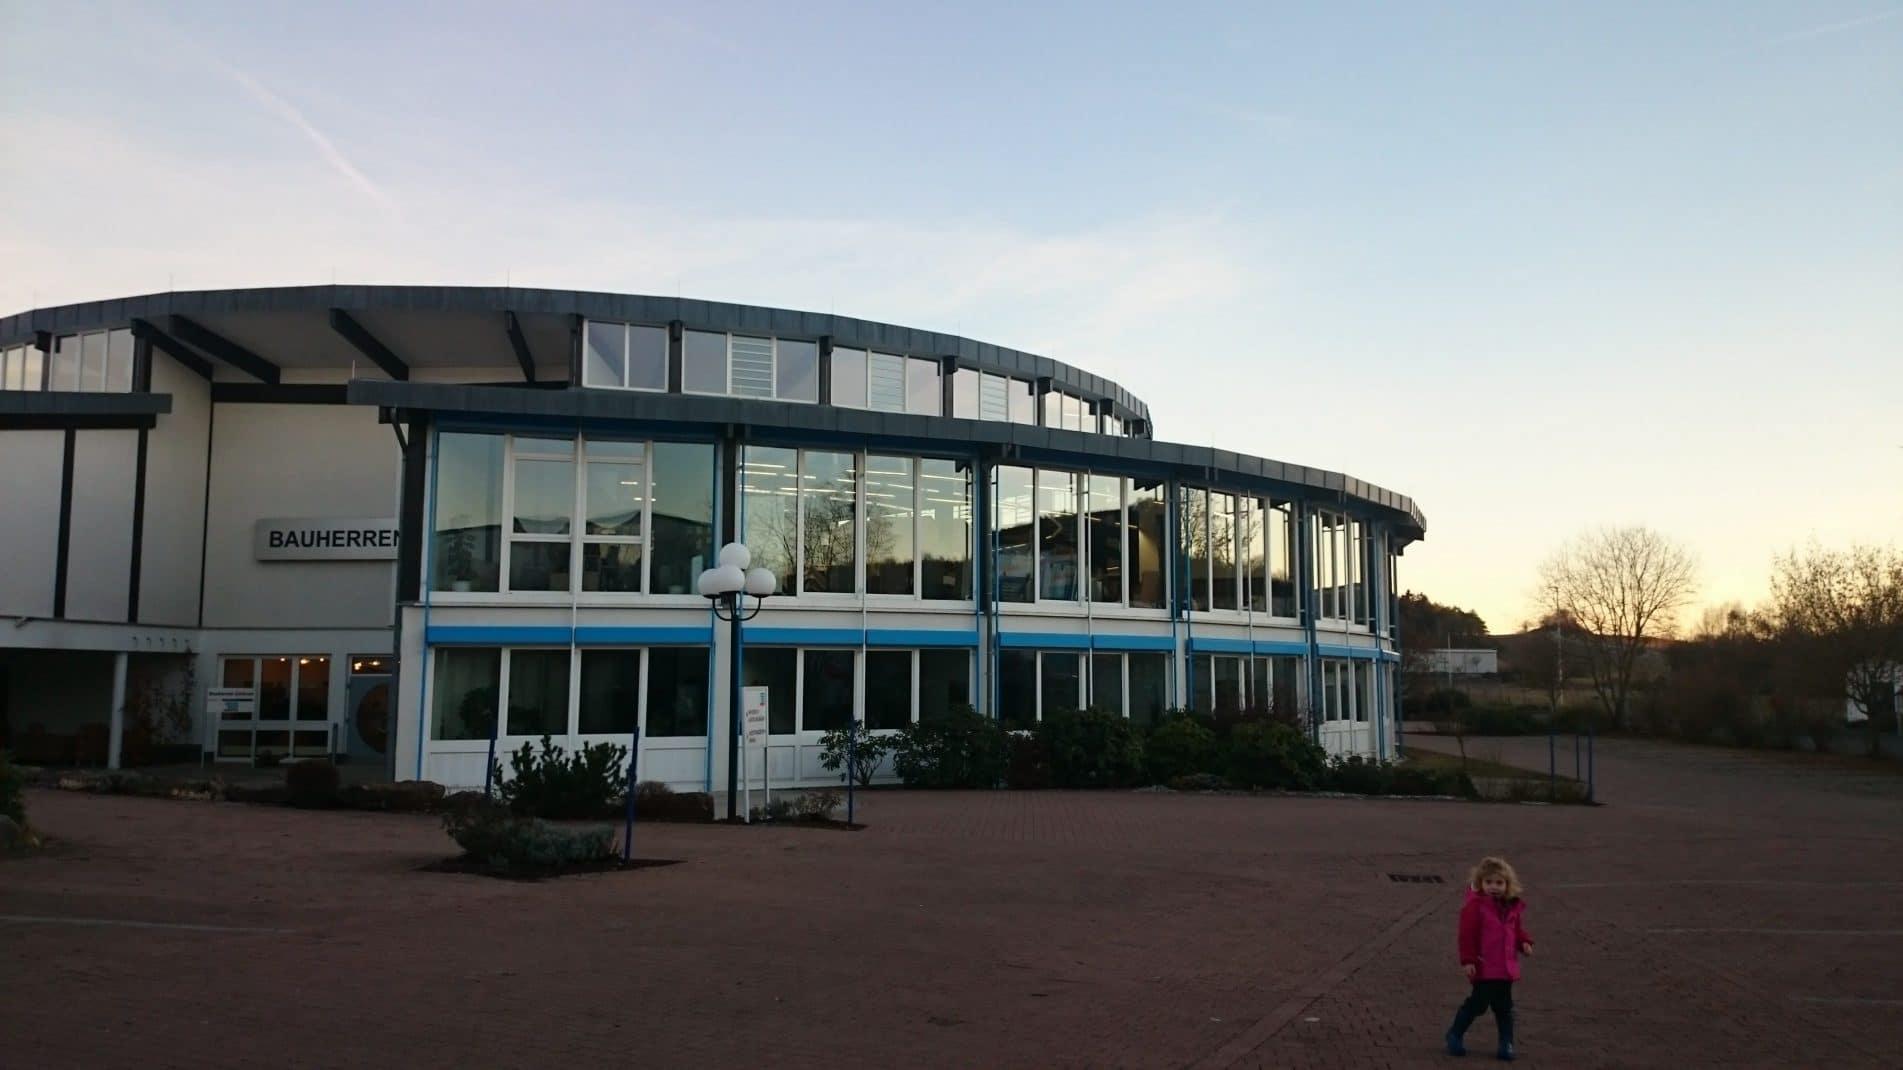 Bemusterung im Bauherrenzentrum Hanse Haus